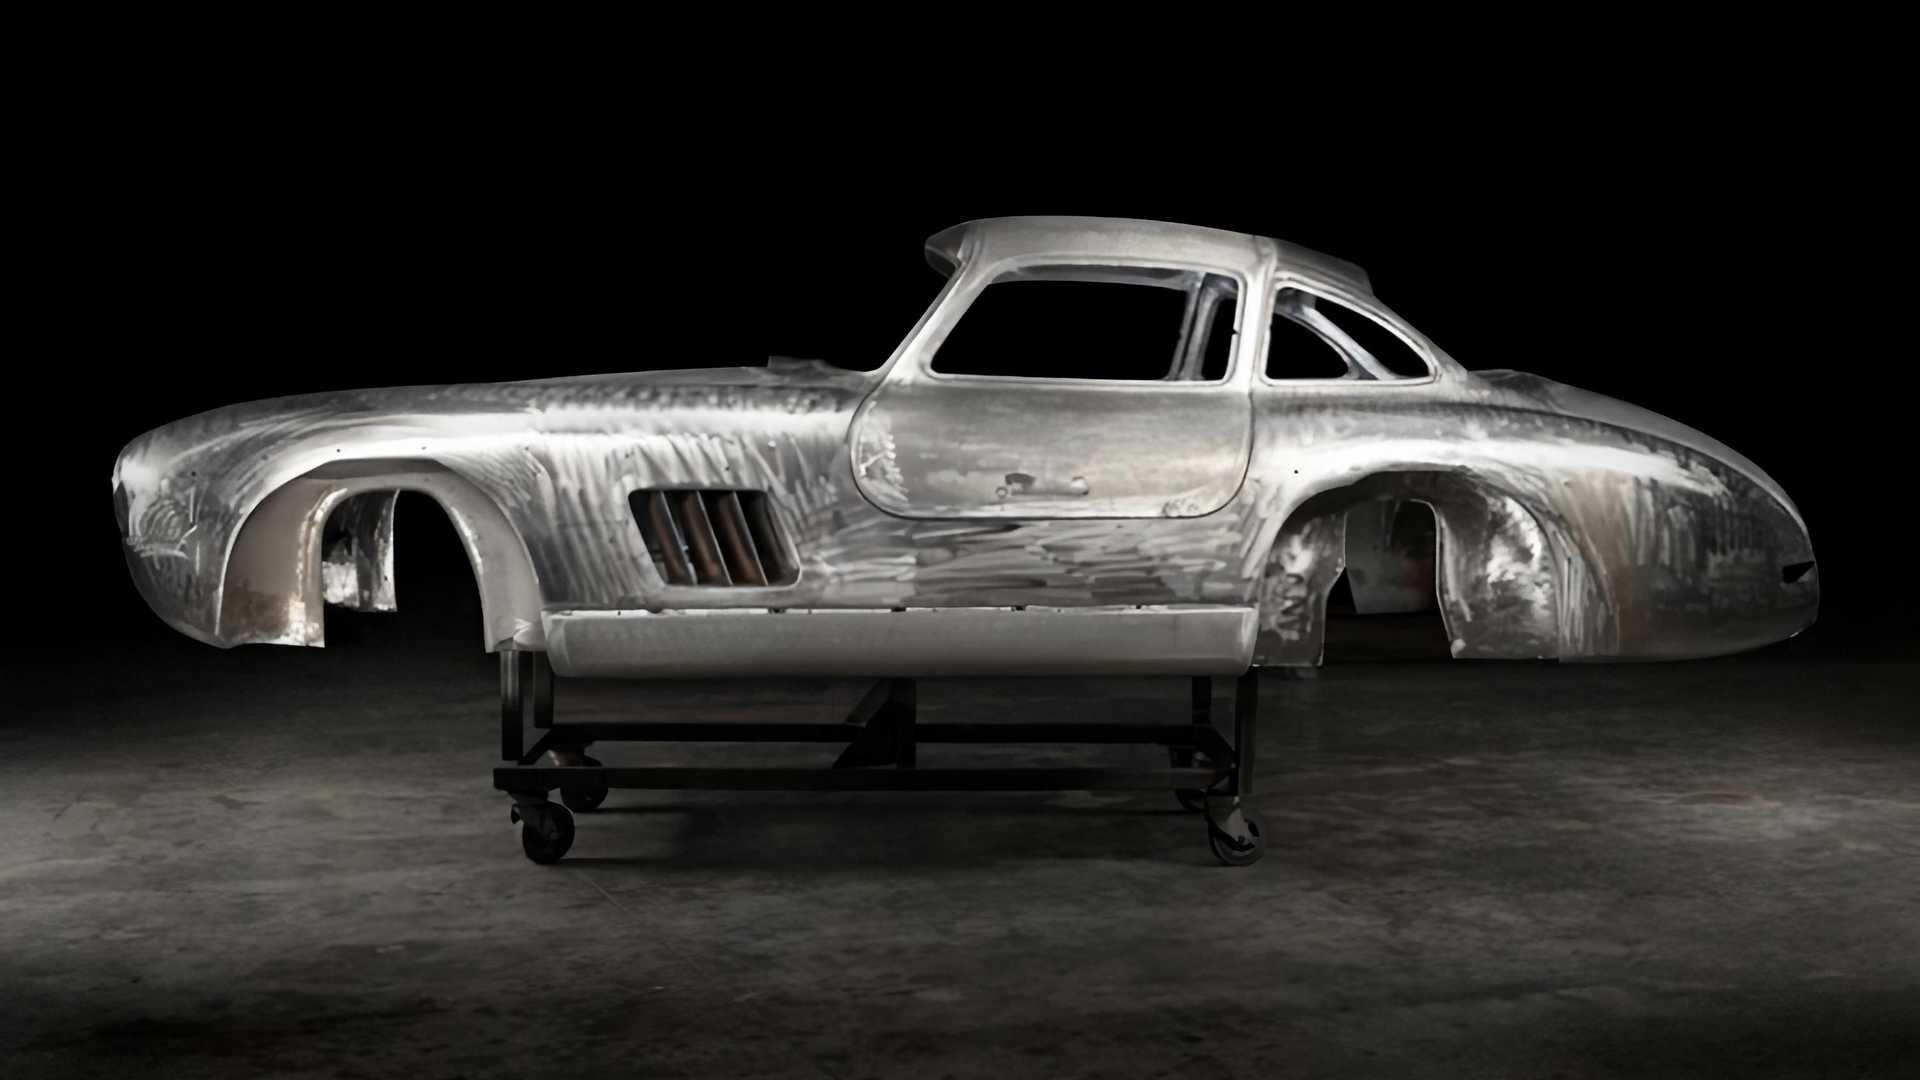 Kisah Dibalik Kesempurnaan Restorasi Mercedes-Benz 300SL Gullwing